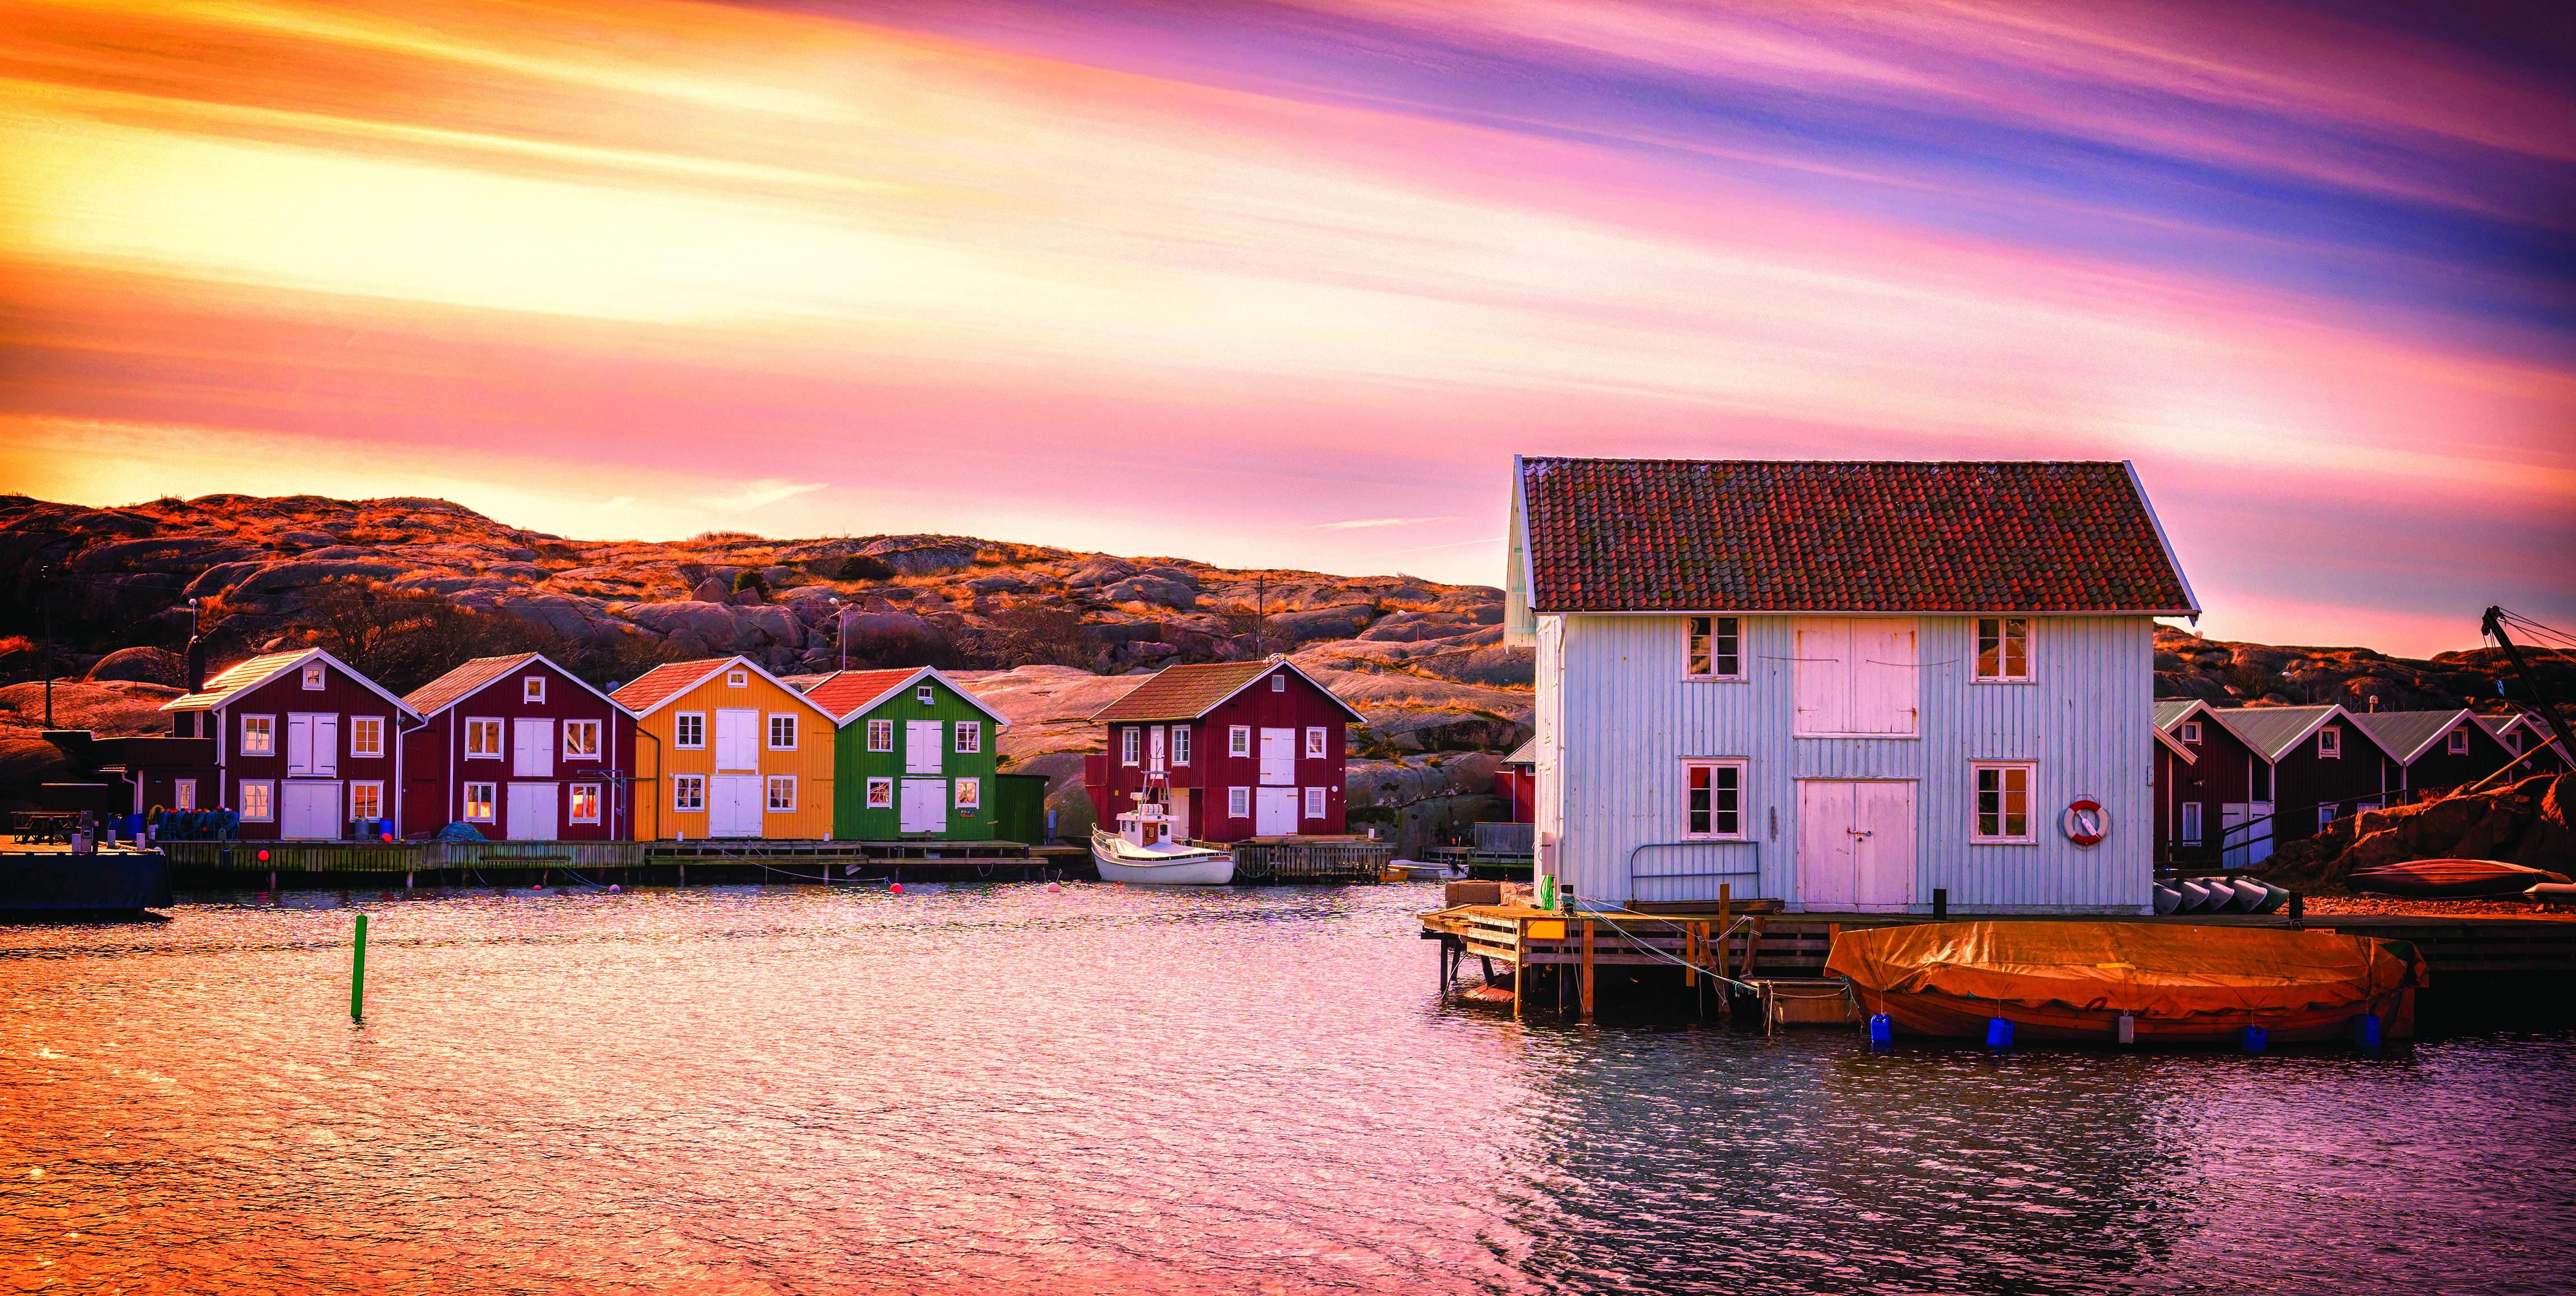 School - CIEE High School Semester/Year Abroad Program in Sweden  1